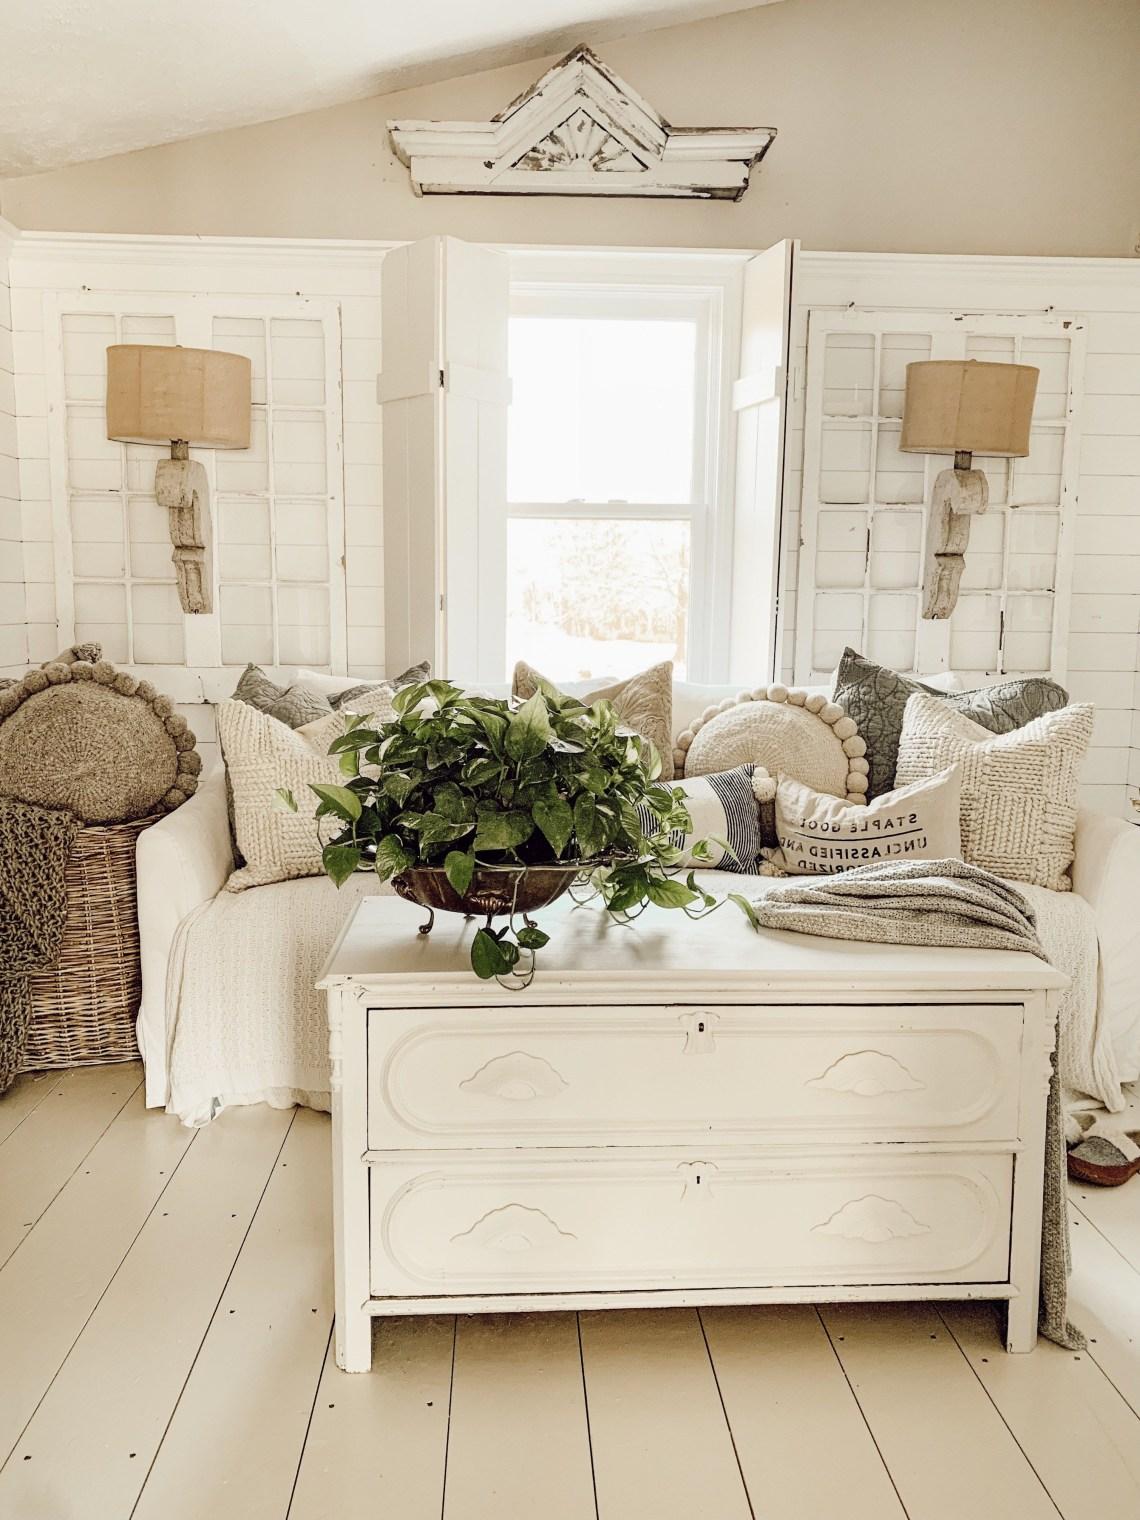 A Start To A Cozy Den Home Decor Inspiration Home Decor